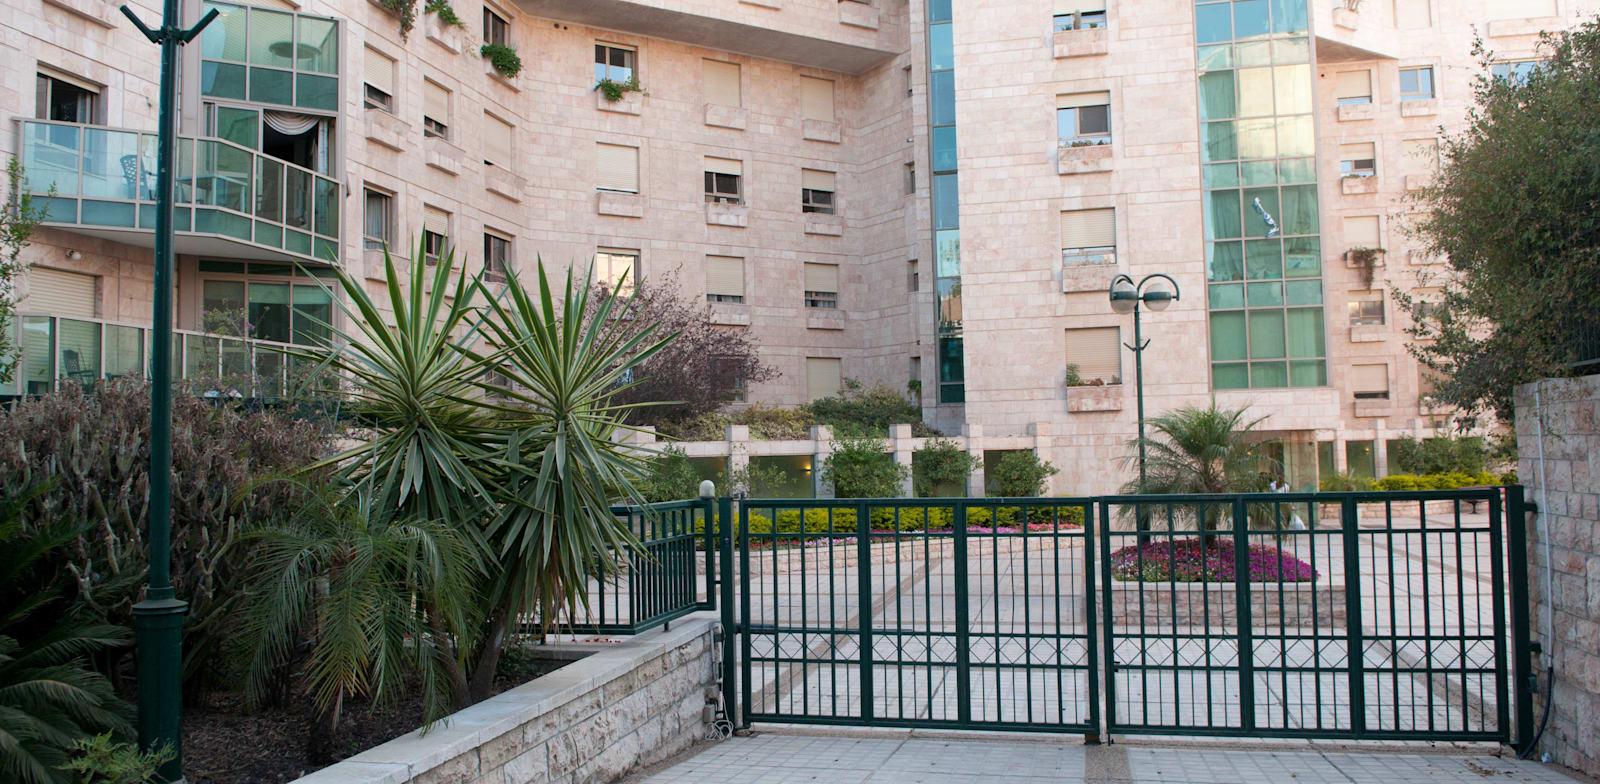 Jerusalem housing Photo: Oria Tadmor